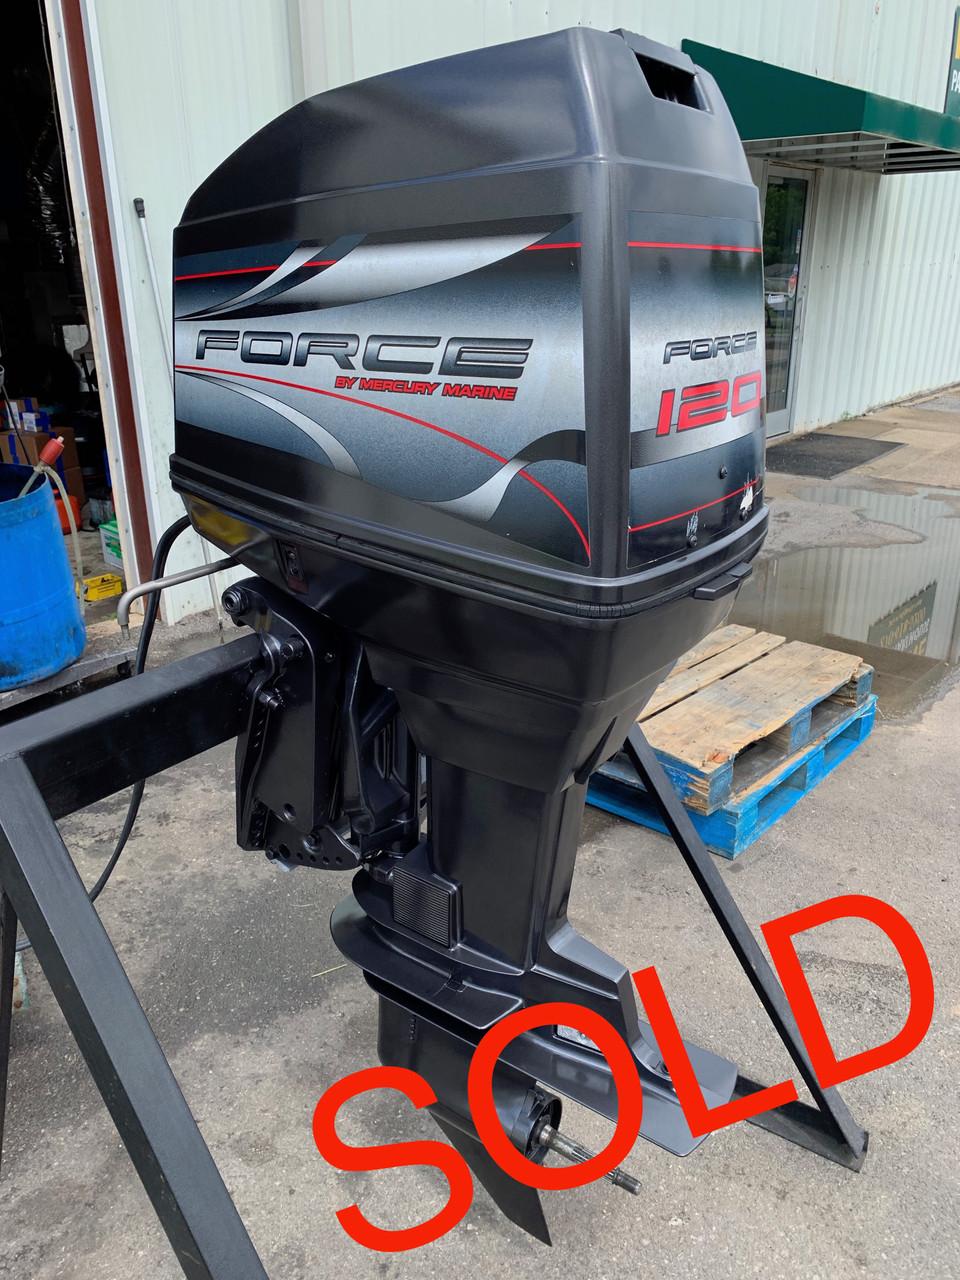 1999 Mercury/Force 120 HP 4 Cylinder Carbureted 2-Stroke 20